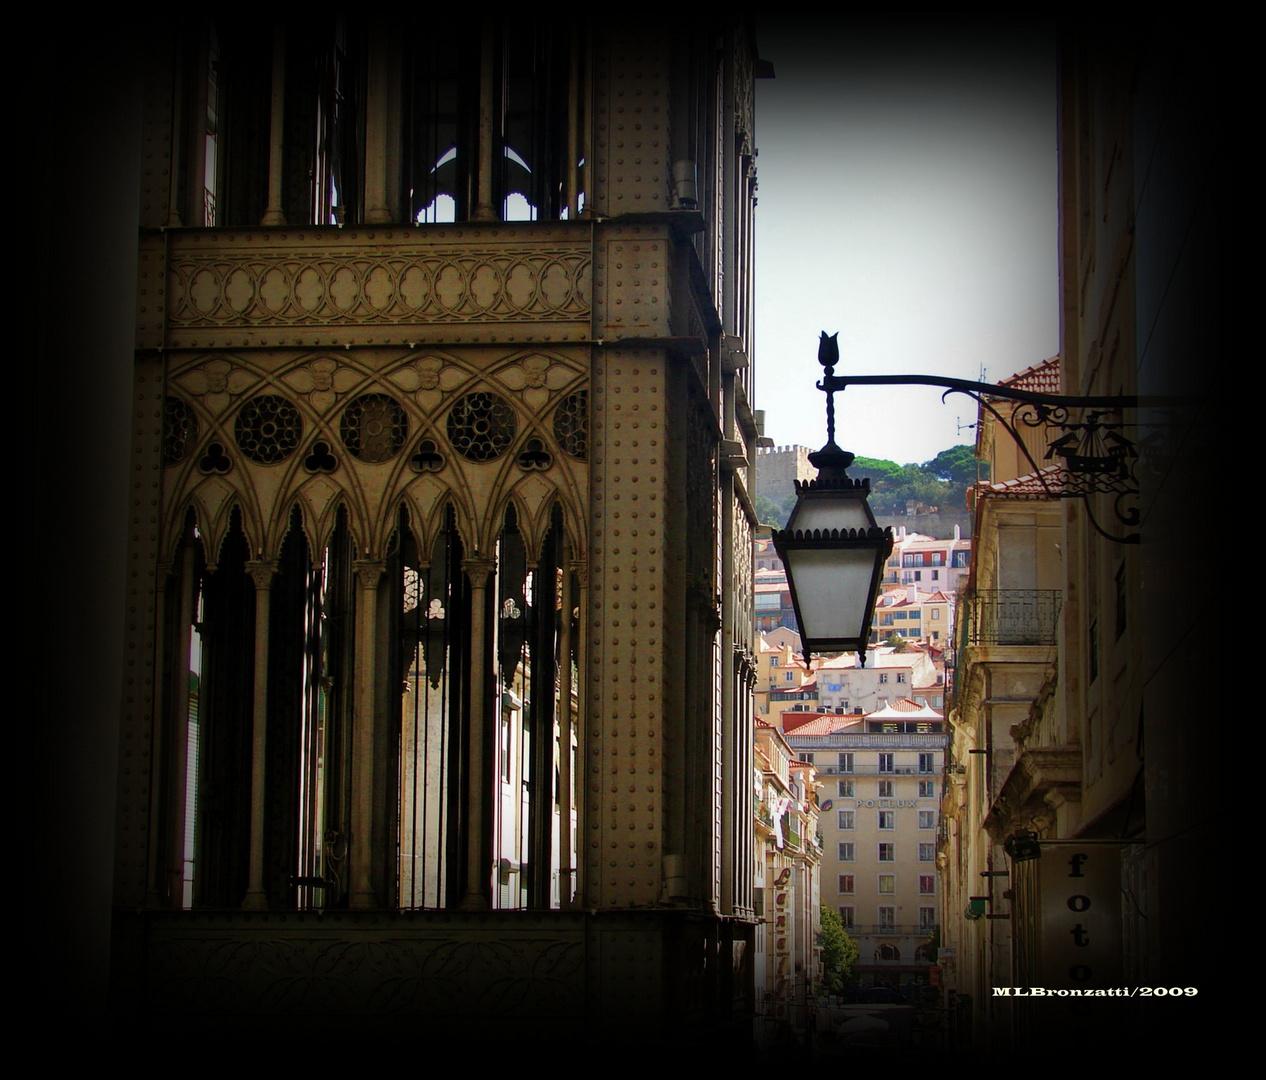 Retalhoa da Velha Lisboa,7 (Patchwork of old Lisbon, Portugal)